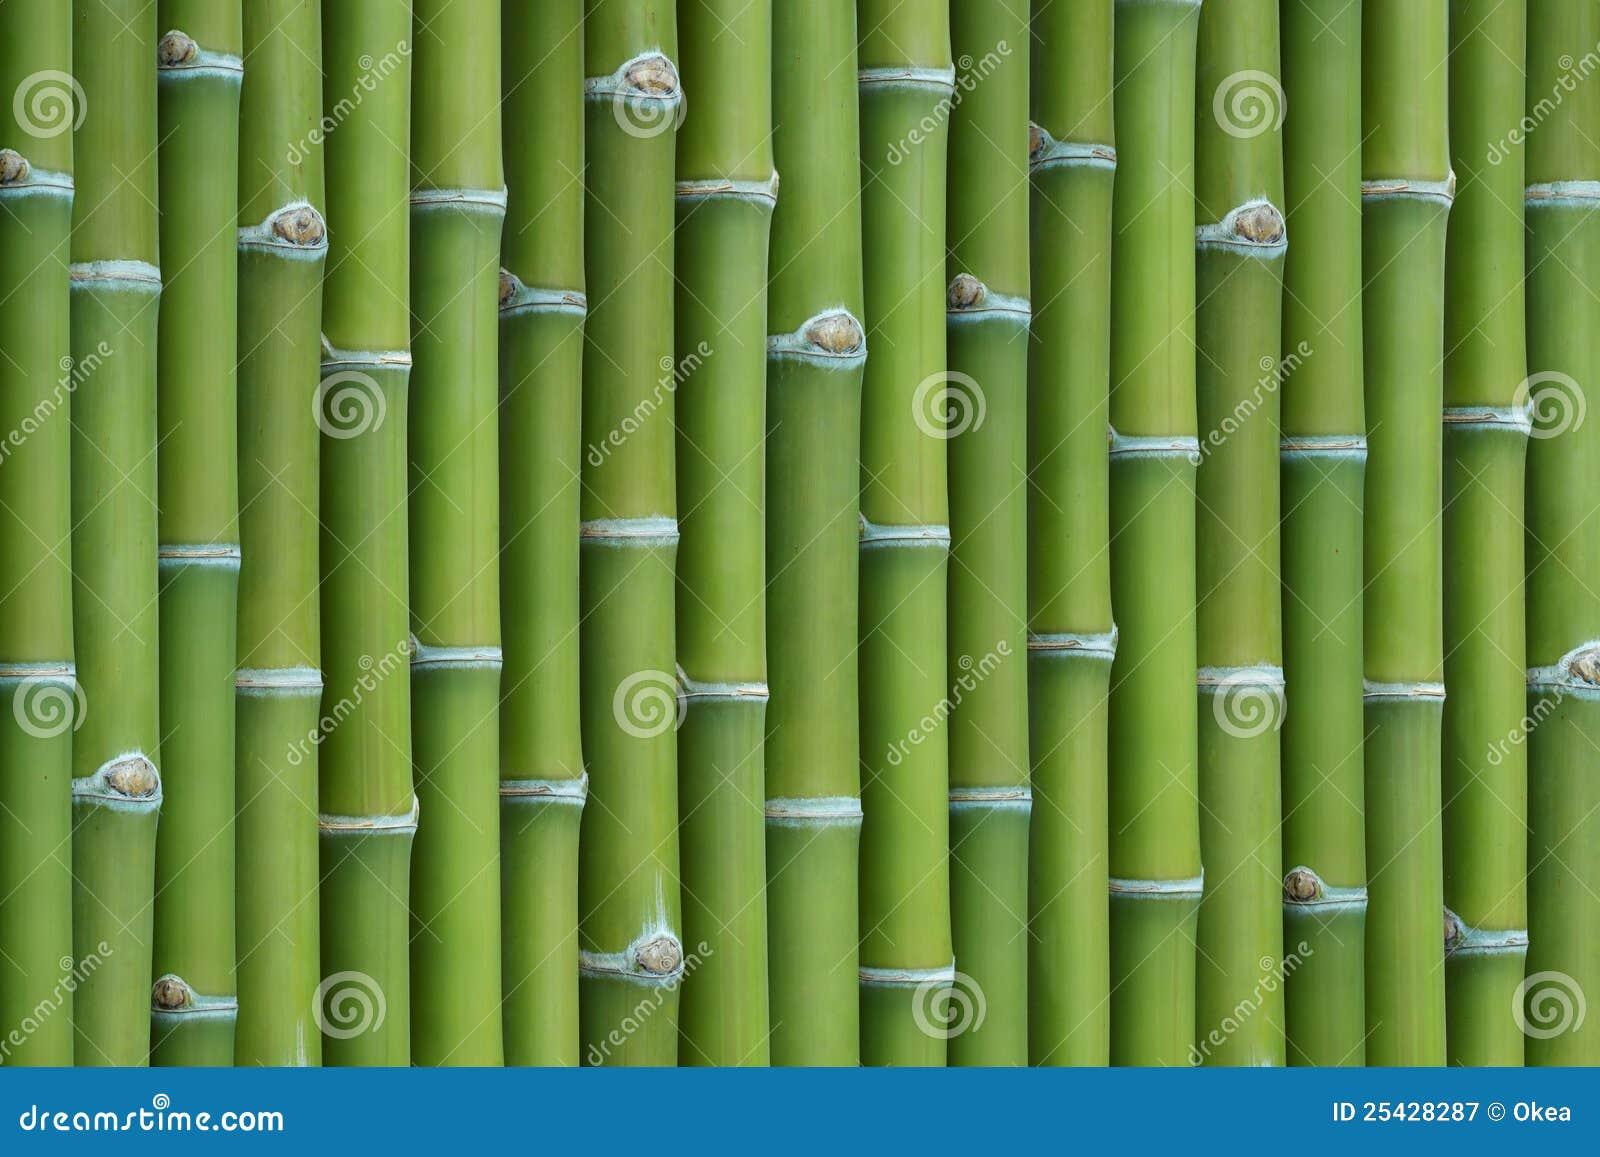 Cartoon Bamboo Stick ~ Bamboo background vector illustration cartoondealer